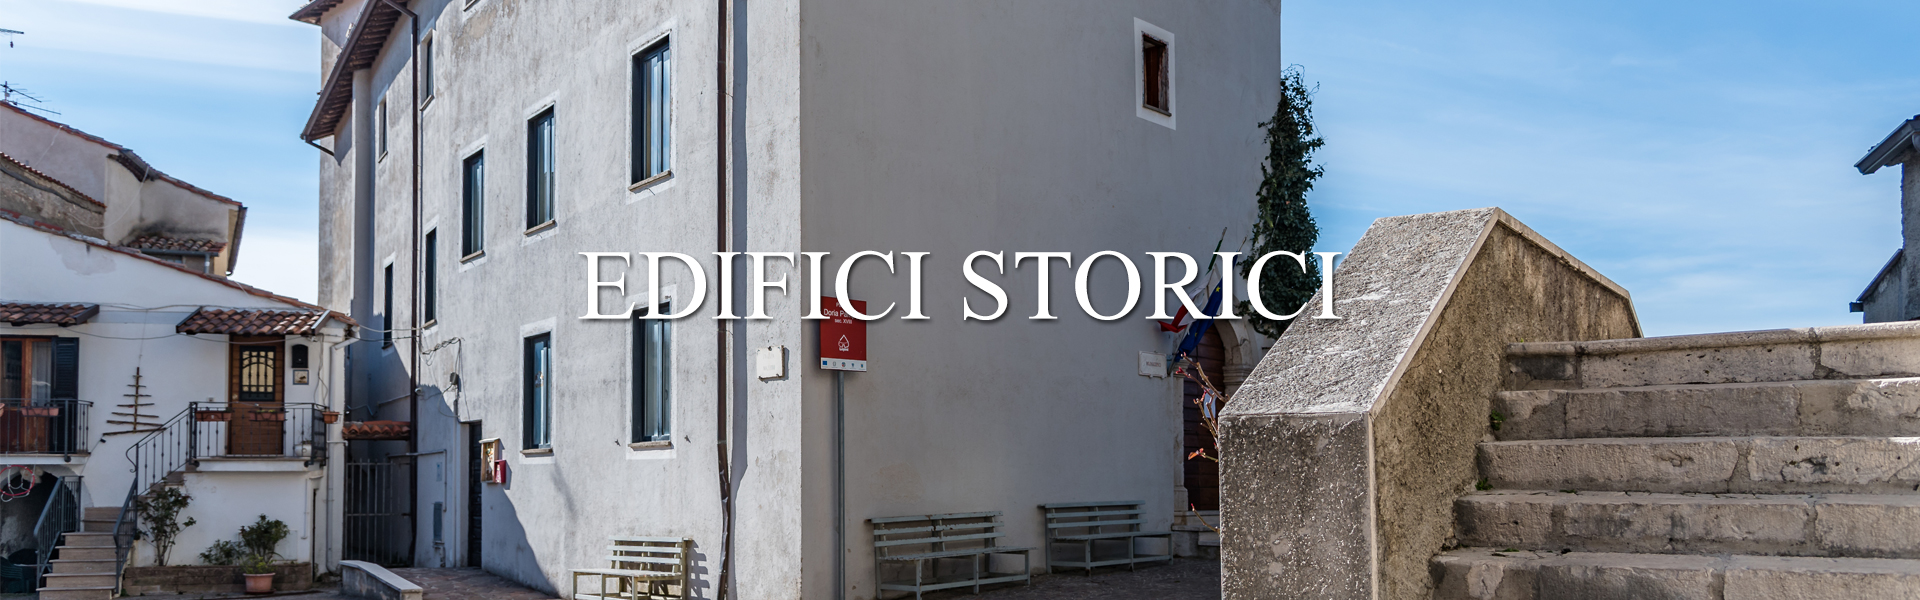 copertina-edifici-storici